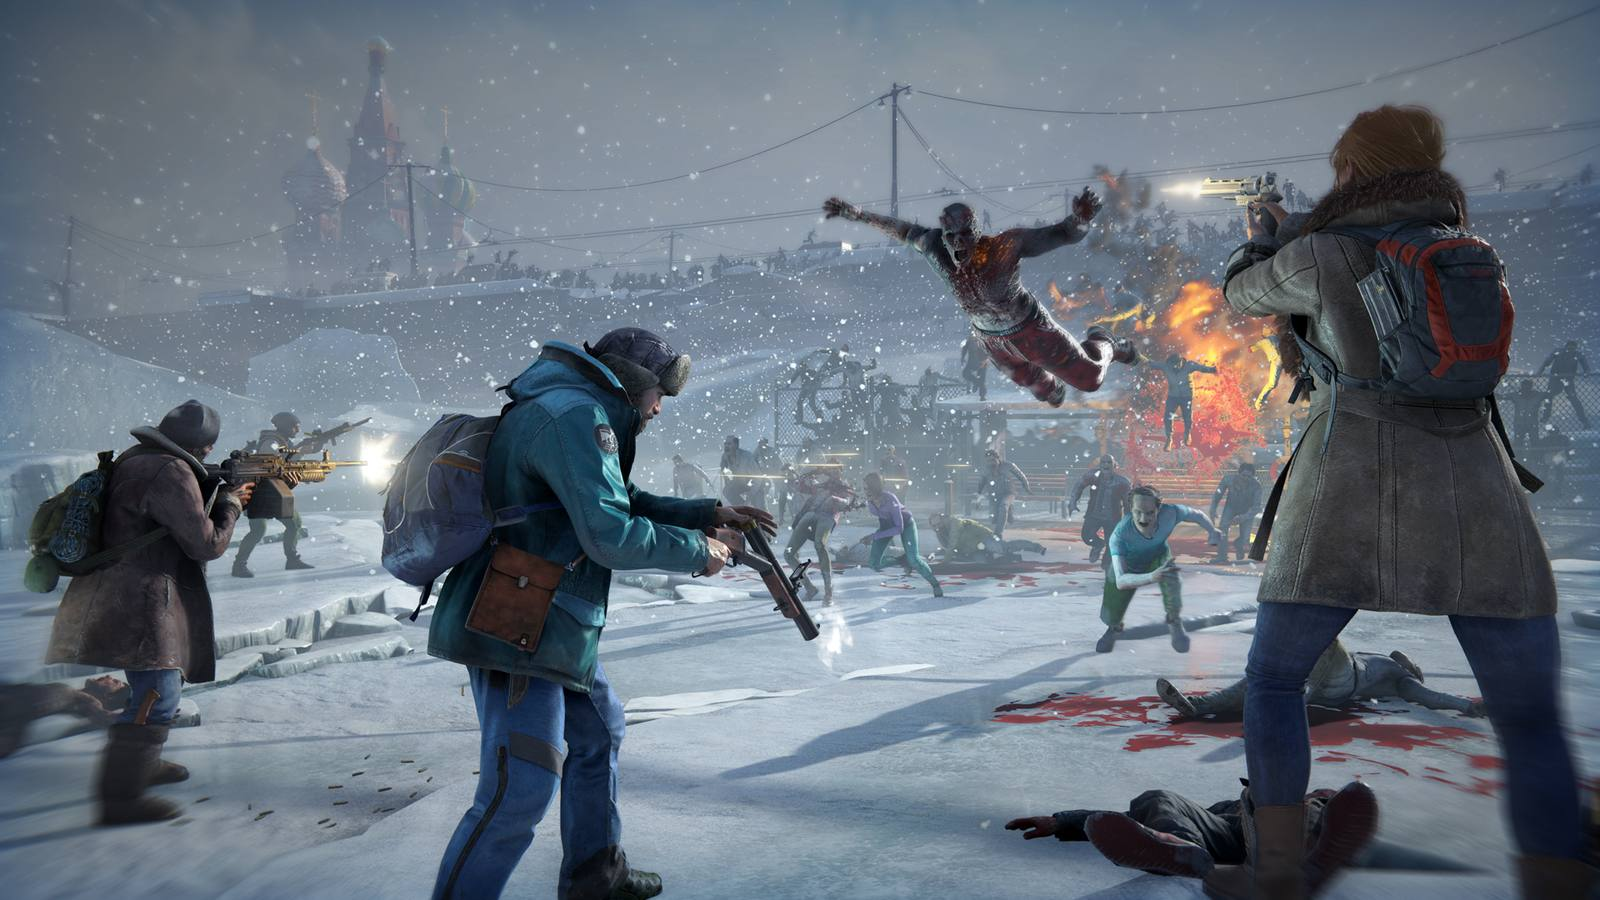 Zona Gamer: Cooperación ante la muerte